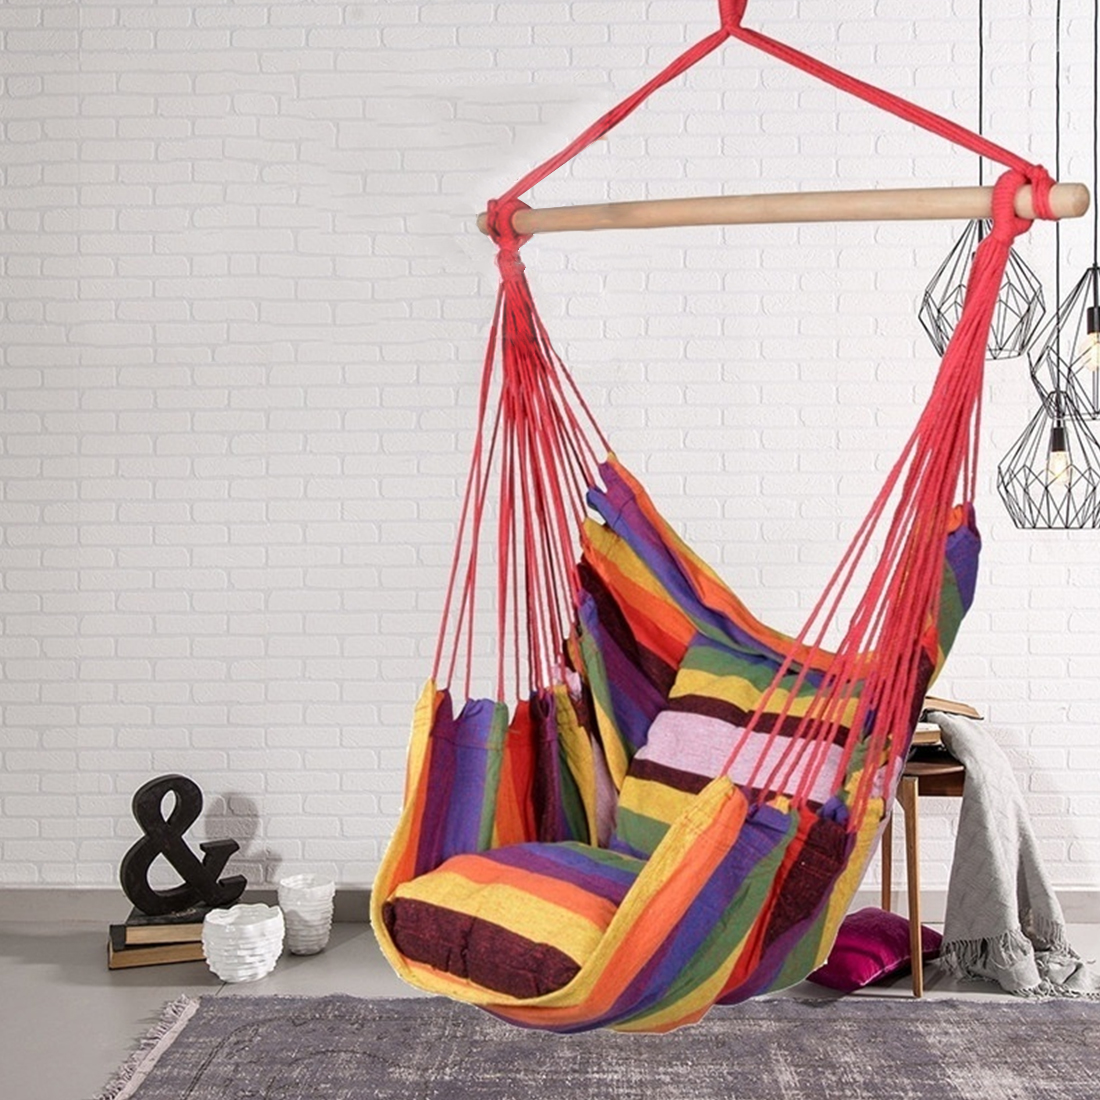 Portable Hammock Chair Hanging Rope Chair Swing Chair Seat With 2 Pillow Hammock Chair Swing Chair Seat Travel Camping Hammock